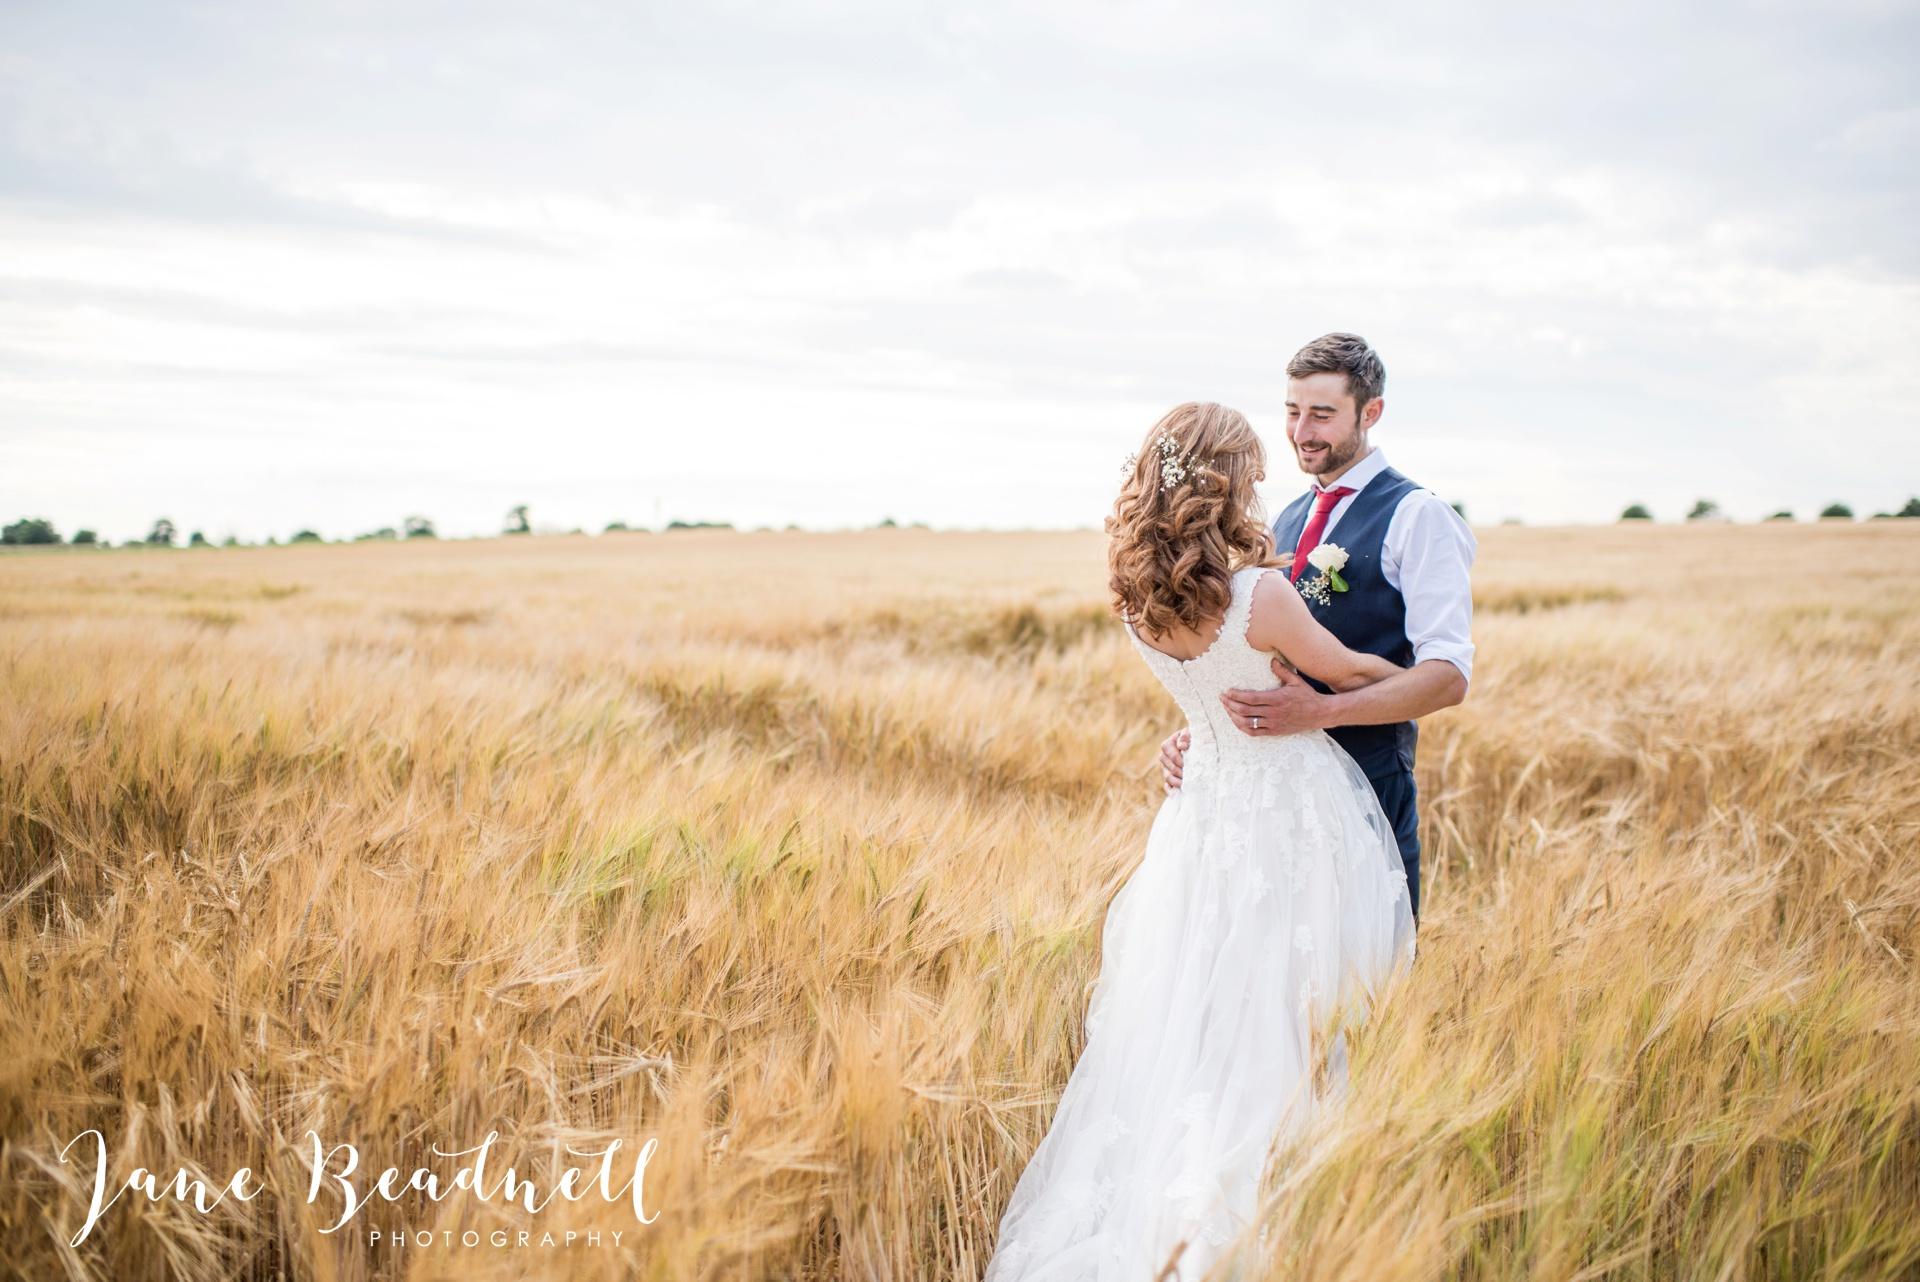 yorkshire-fine-art-wedding-photographer-jane-beadnell-photography-poppleton-york_0123